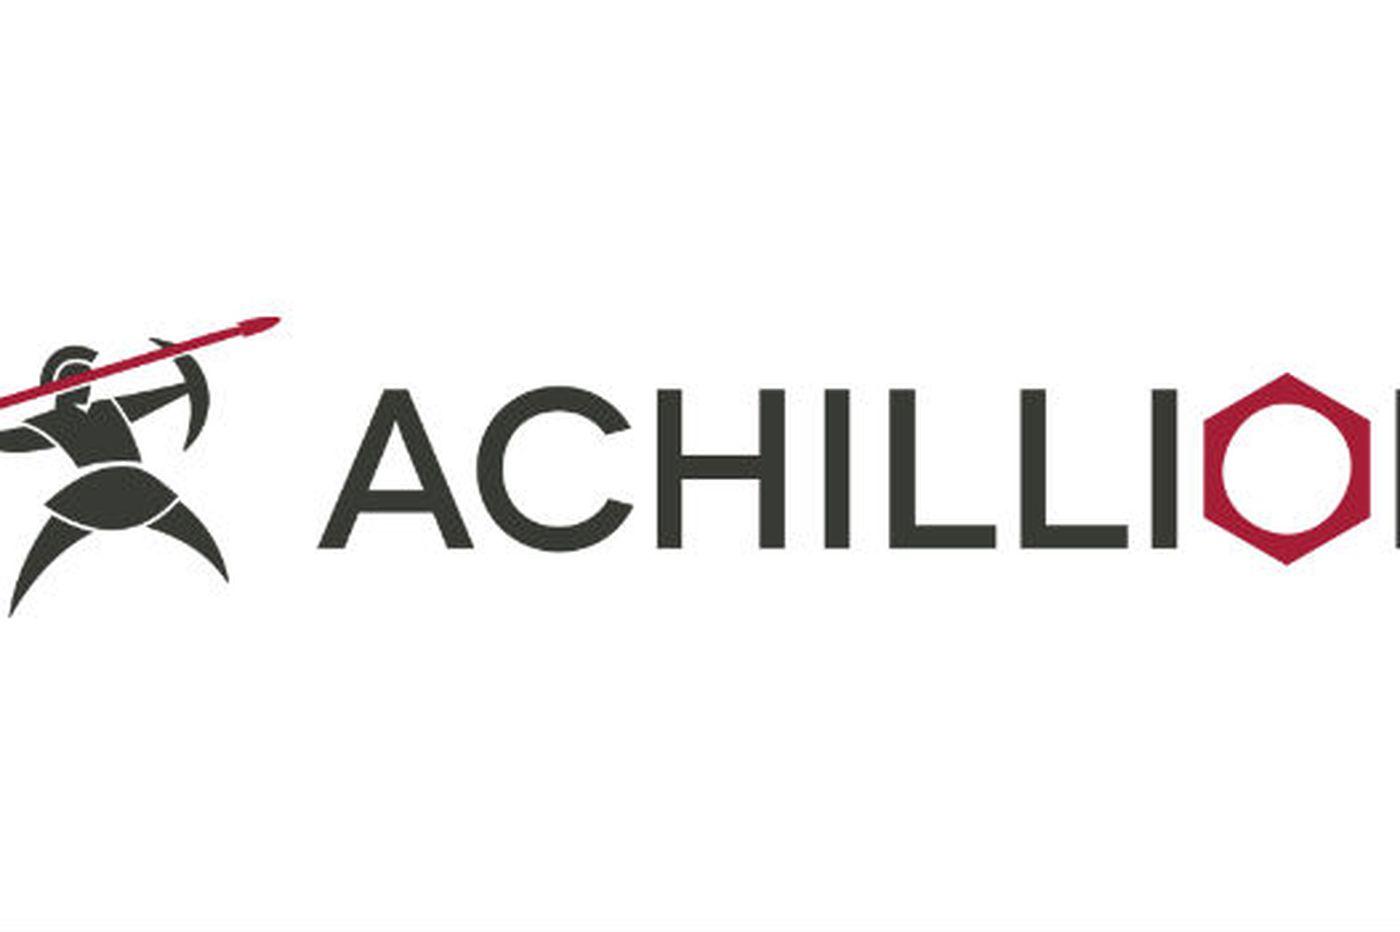 Boston firm acquires Achillion for $930 million, plus extra if drugs advance